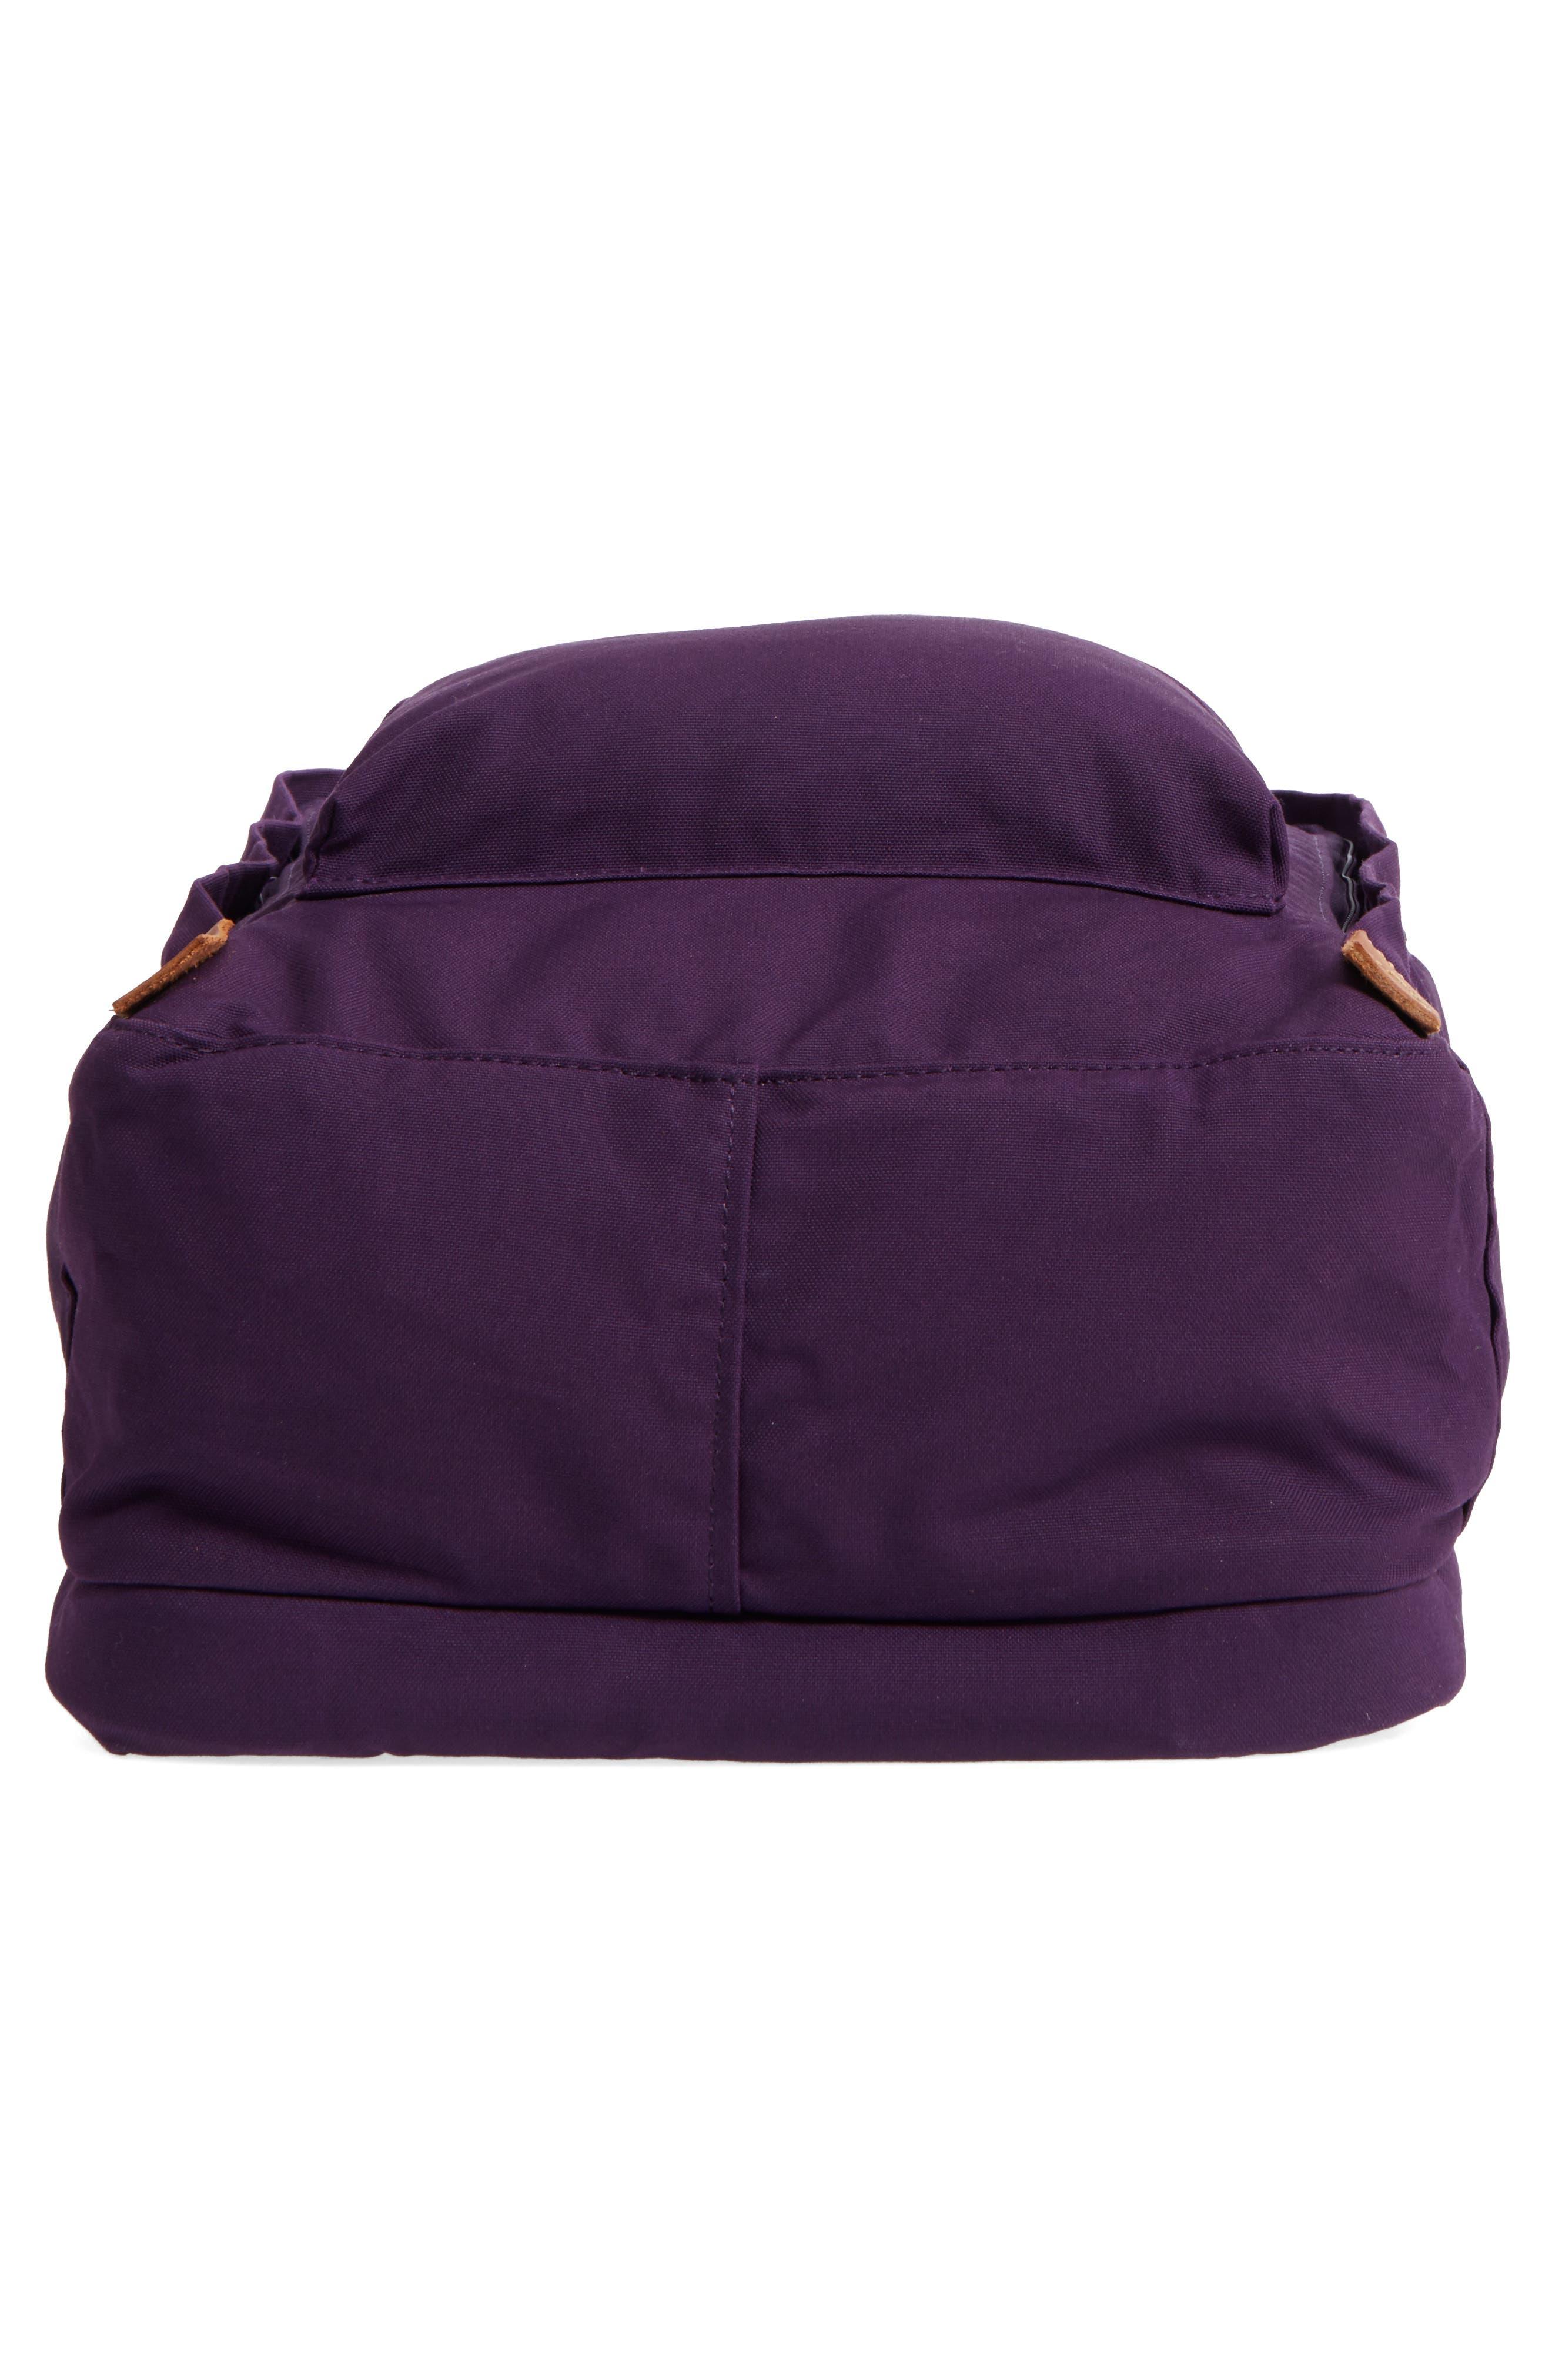 "Kånken No. 2 15"" Laptop Backpack,                             Alternate thumbnail 5, color,                             Alpine Purple"